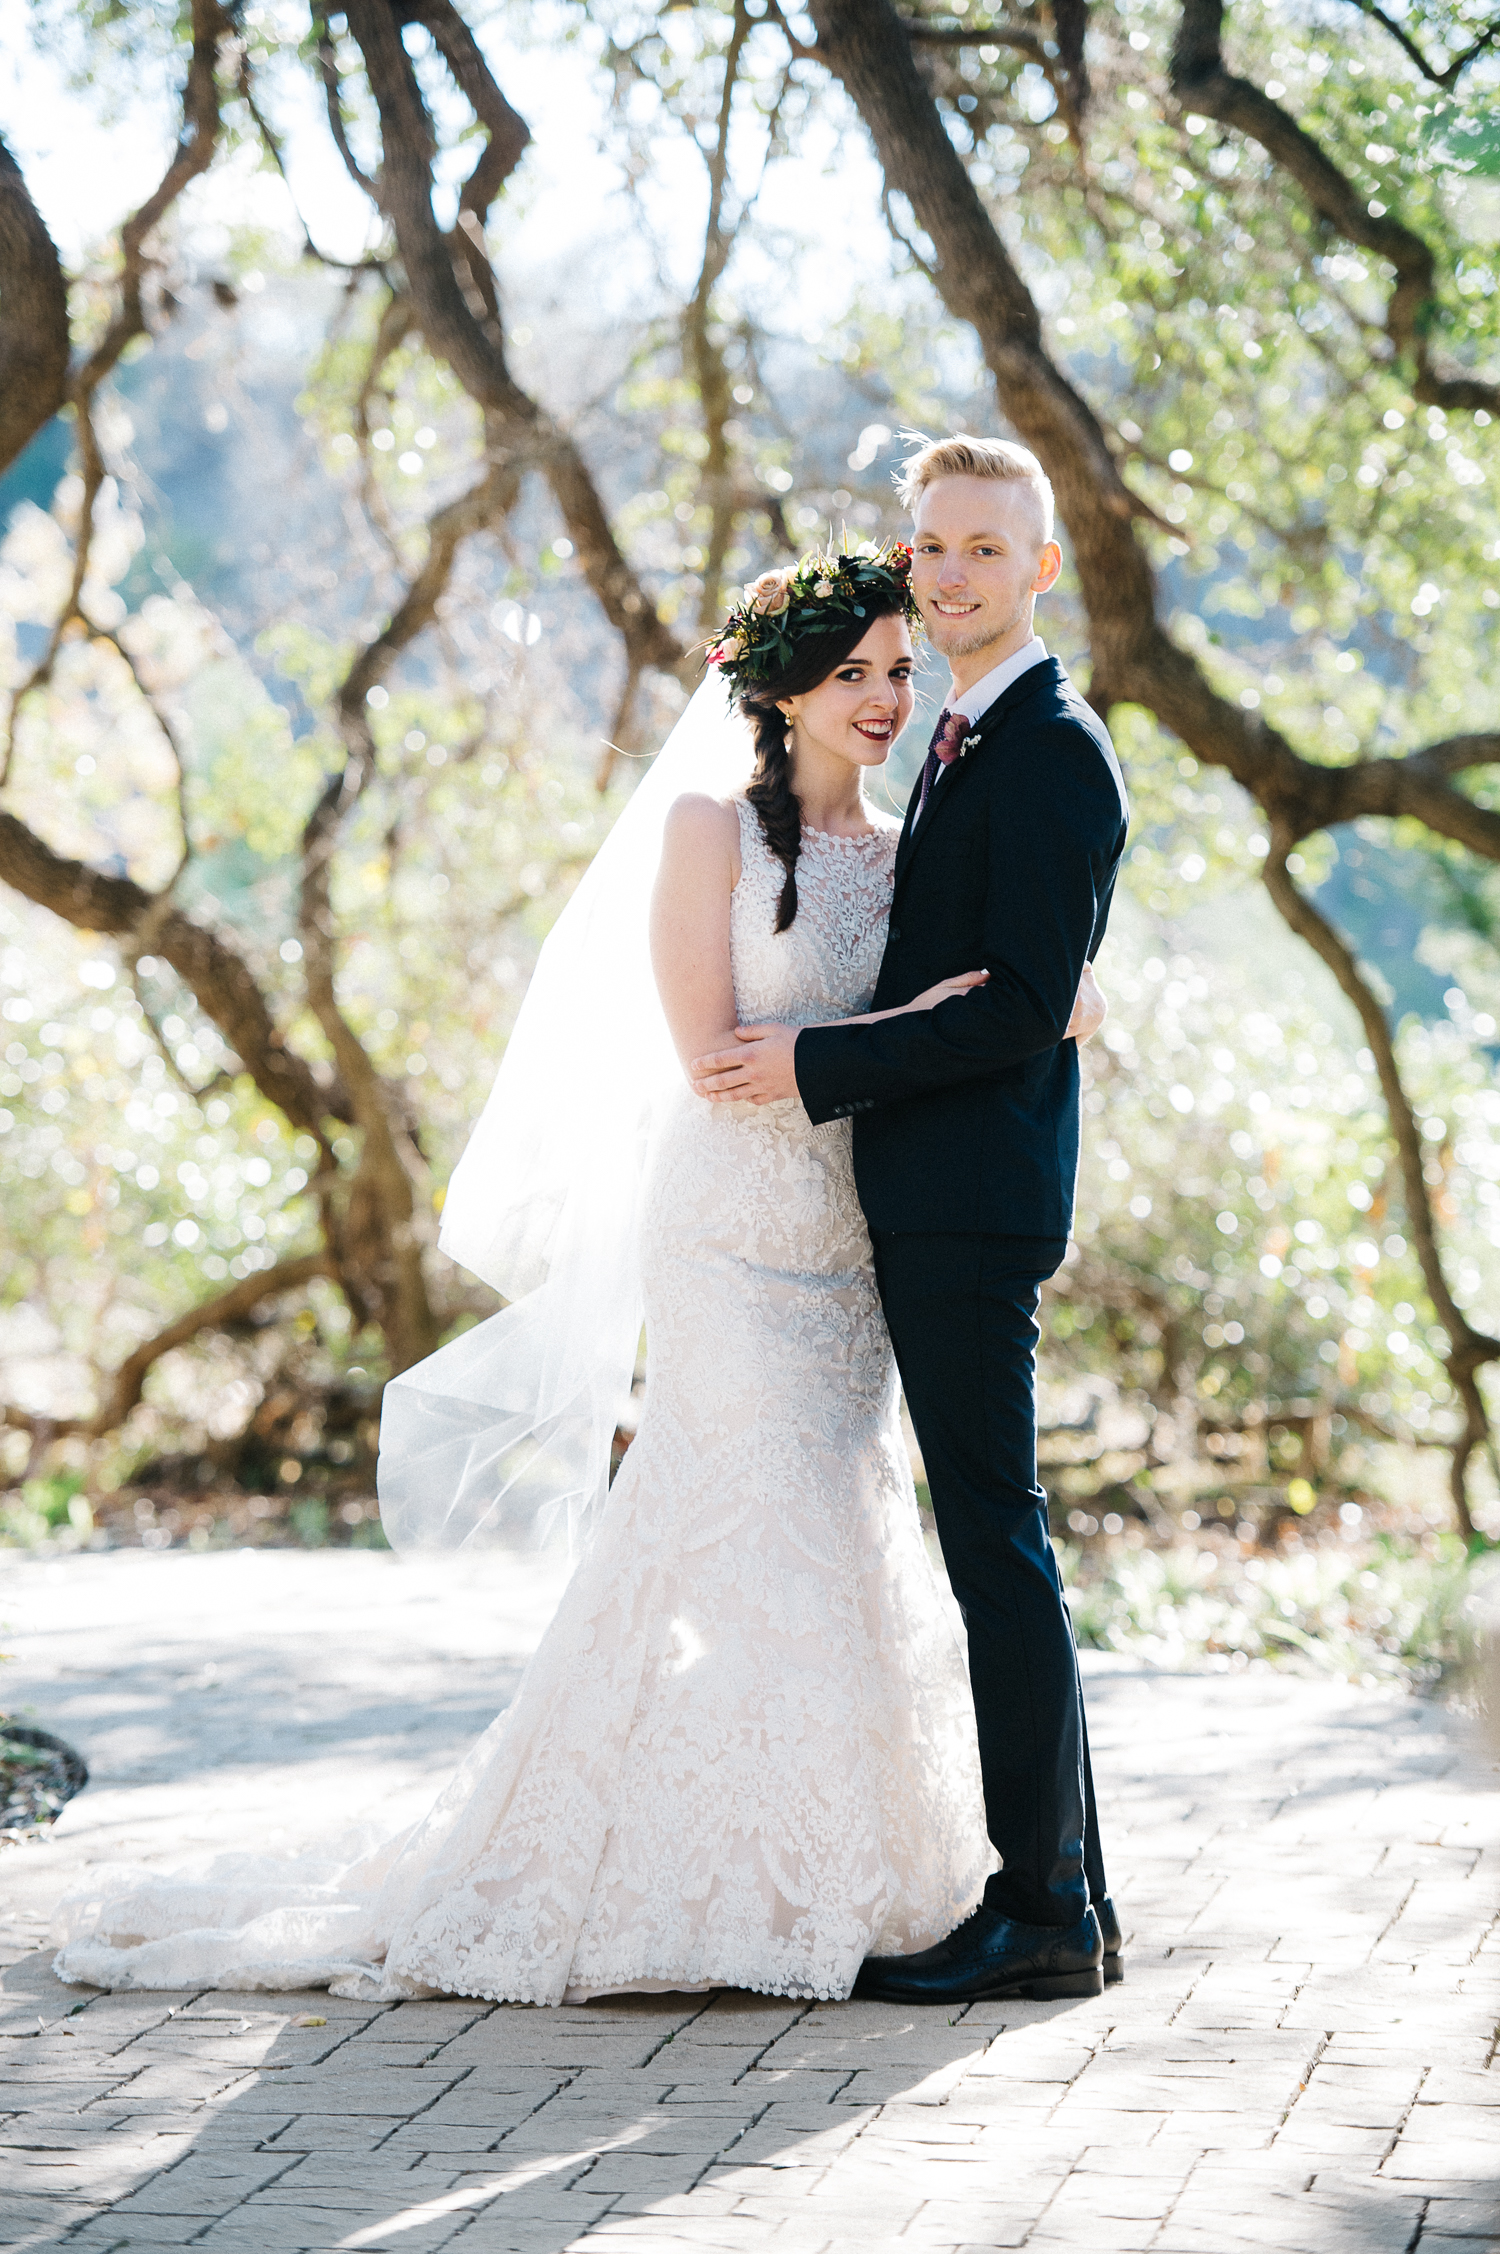 sarah-and-colin-wedding-312.jpg